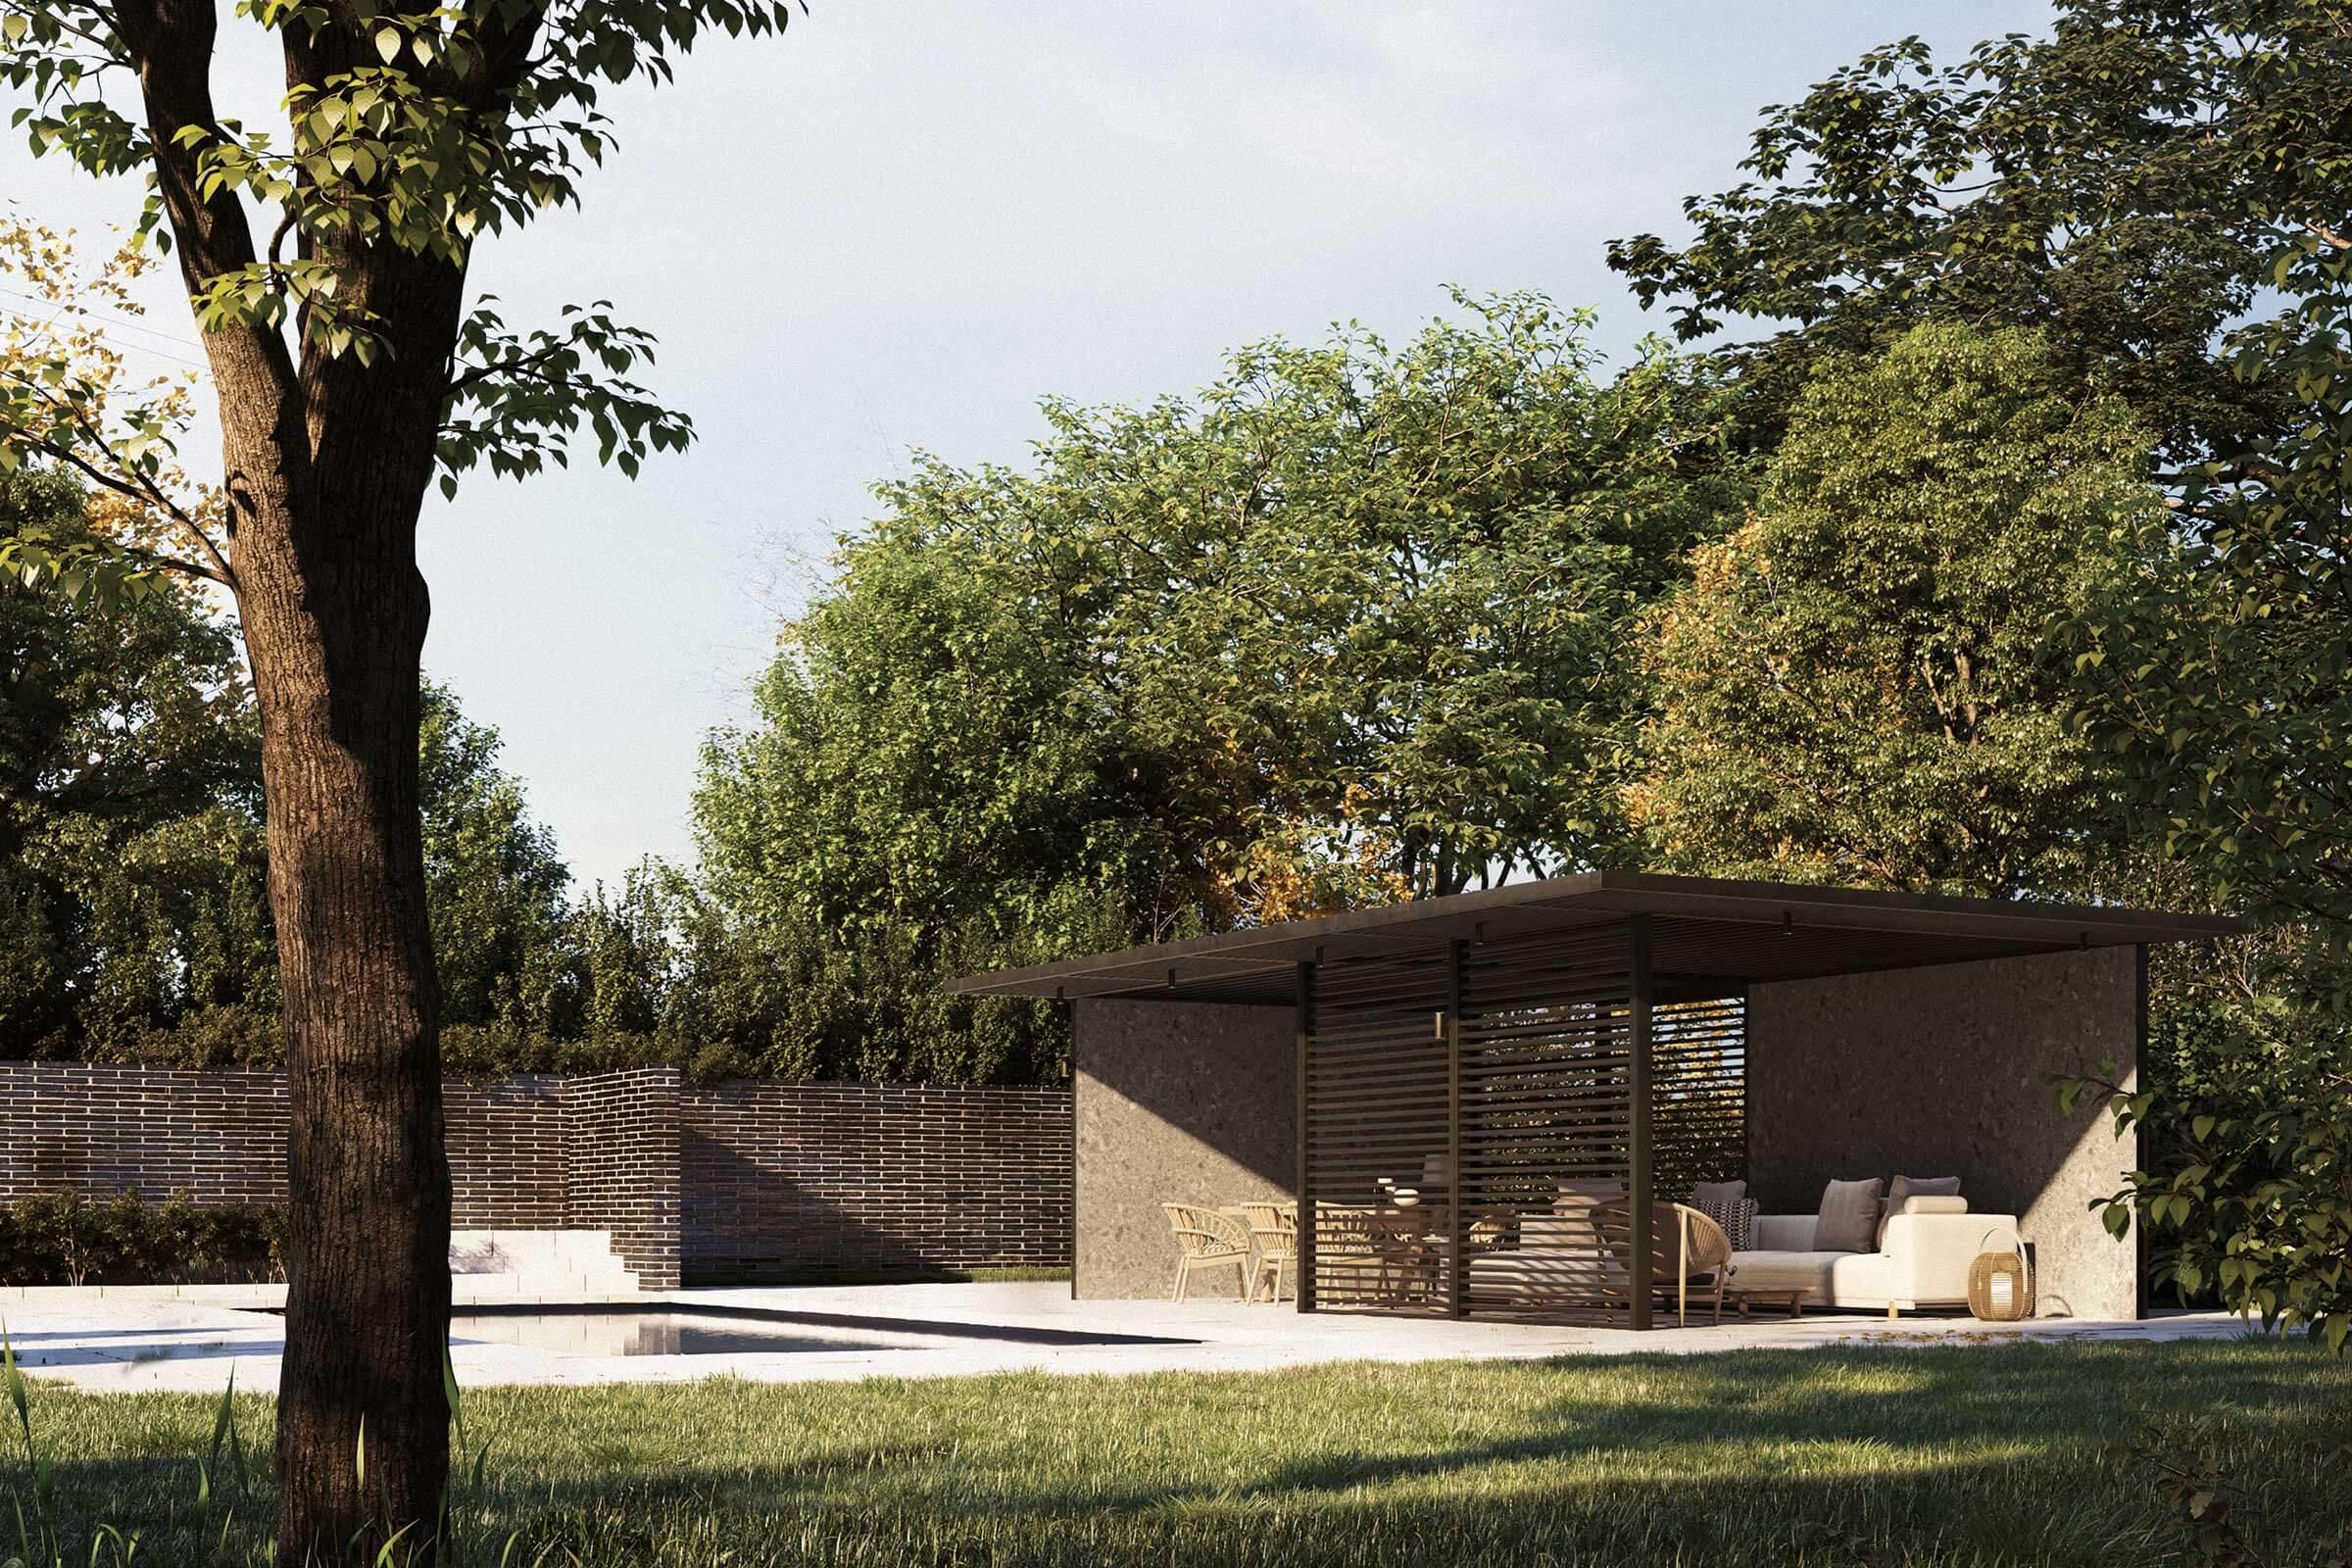 pavilion_H_belgium_house_ceppo_stone.jpg